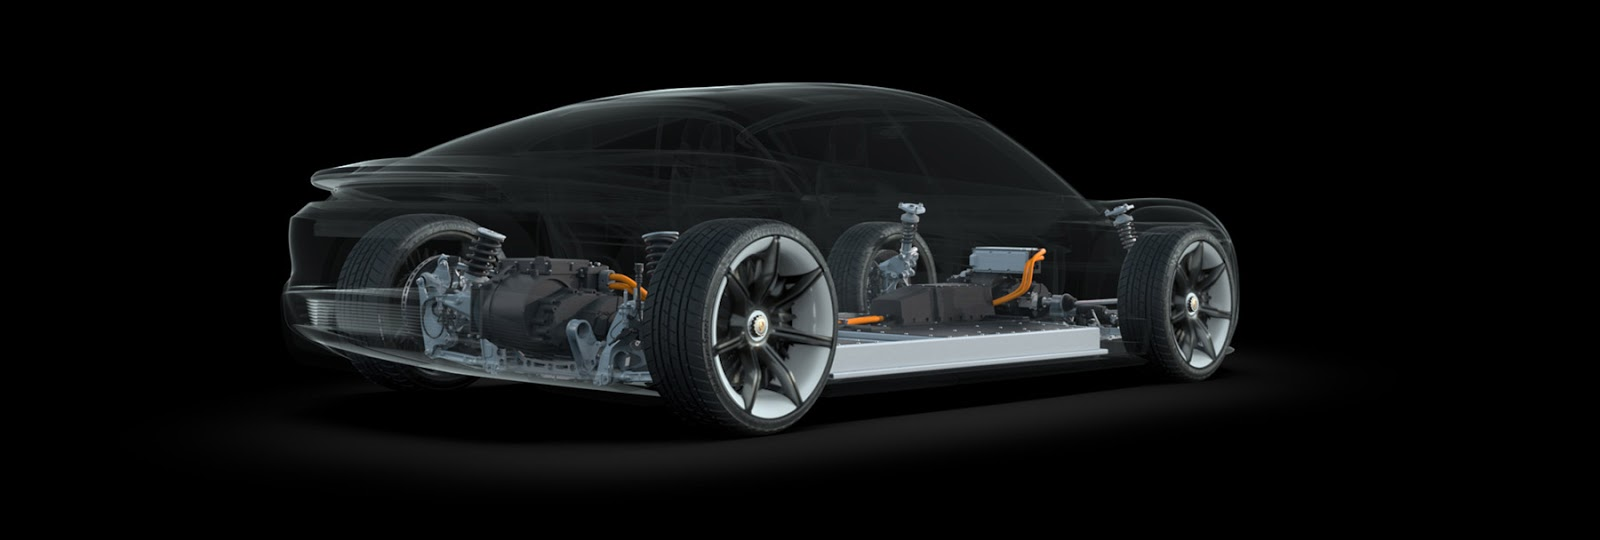 clip 16 Σε τρία χρόνια το πρώτο αποκλειστικά ηλεκτροκίνητο μοντέλο της Porsche Electric cars, Porsche, Porsche 919, Porsche Mission E, supercars, videos, Τεχνολογία